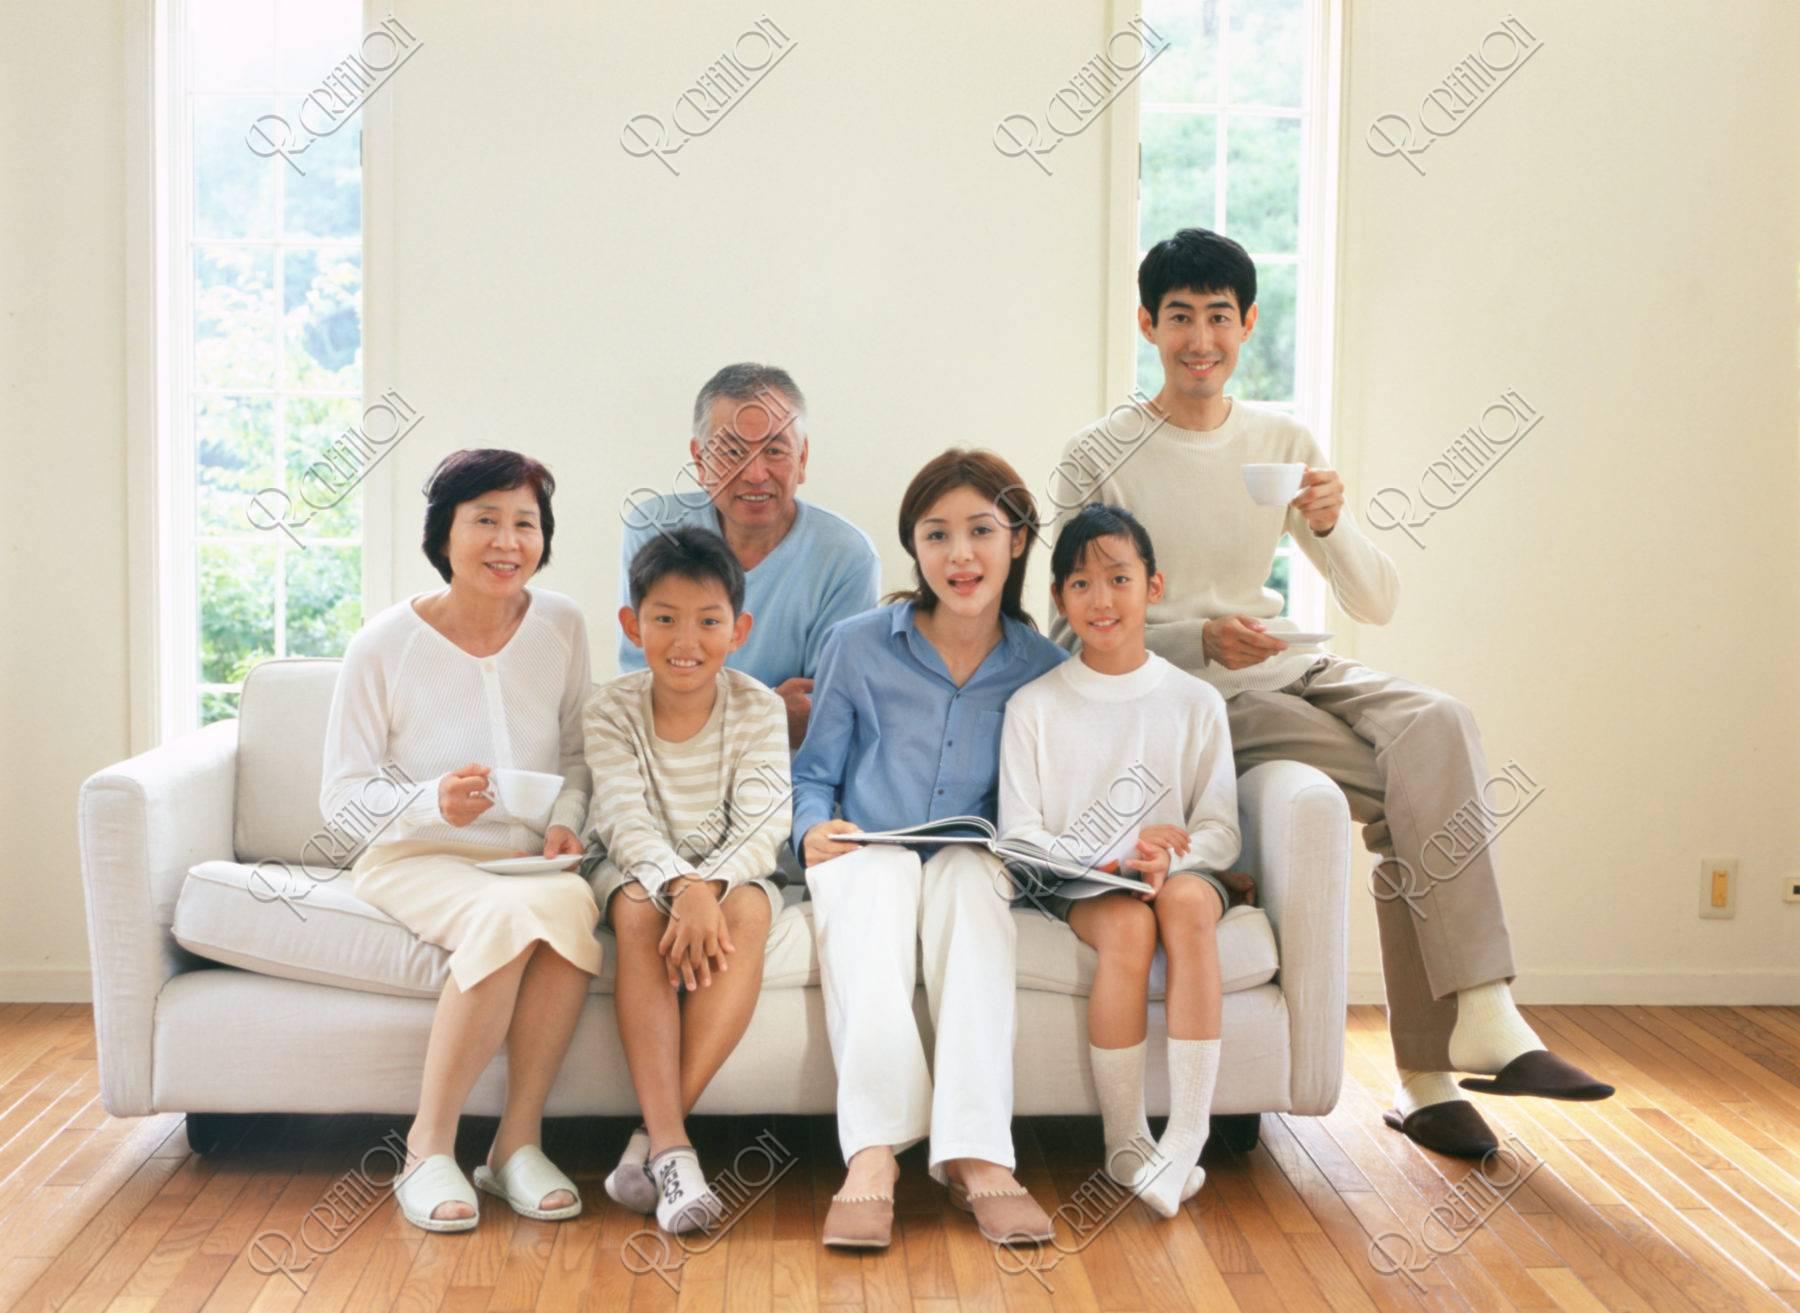 ソファに座る三世代ファミリー